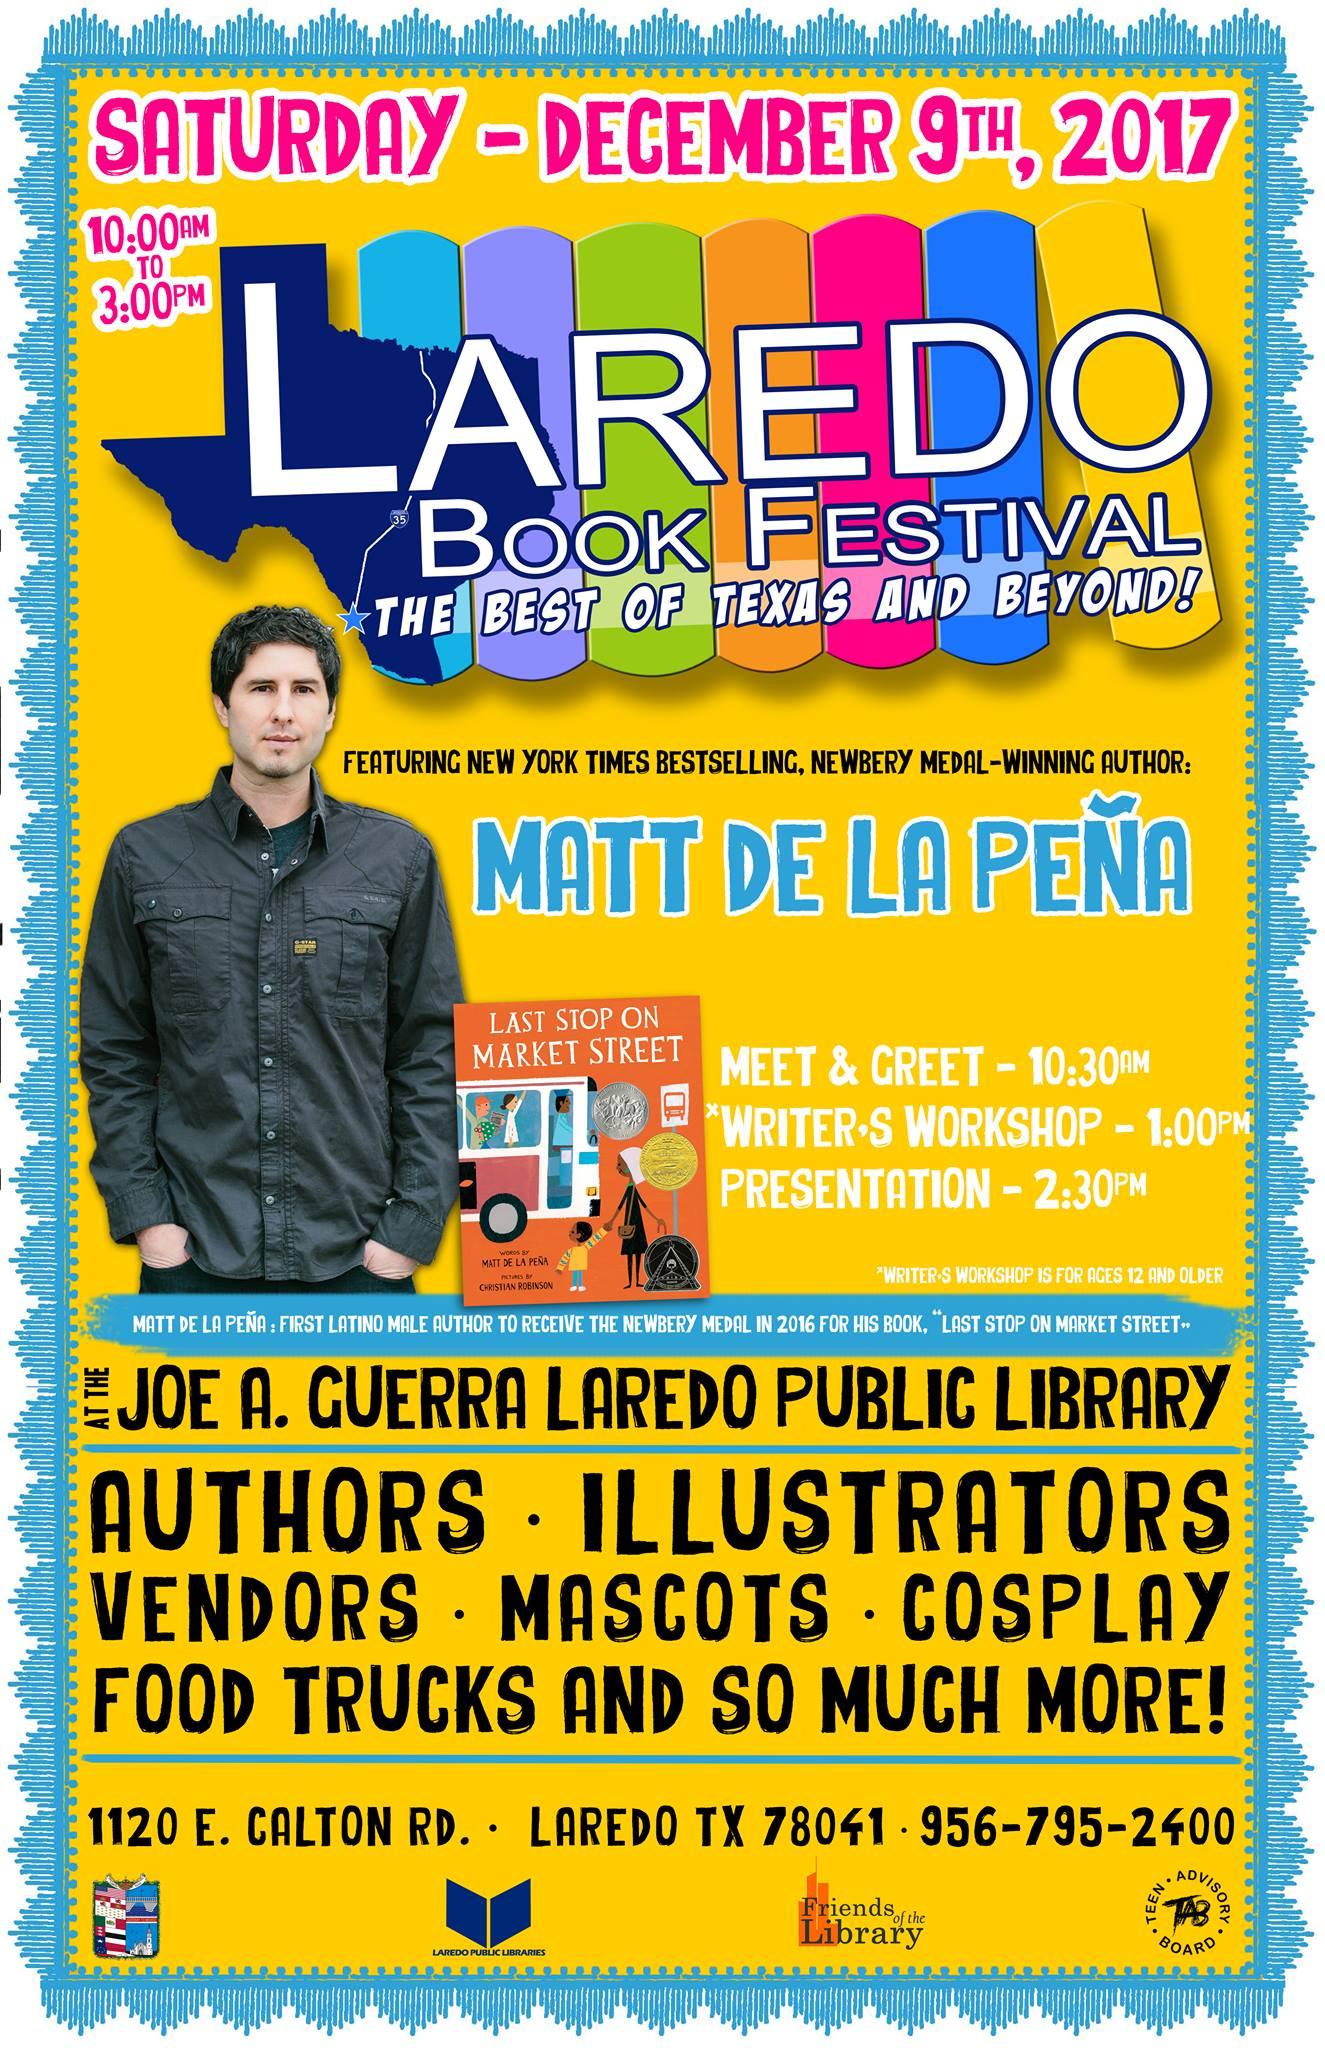 2017.12.09-LaredoBookFestival.jpg